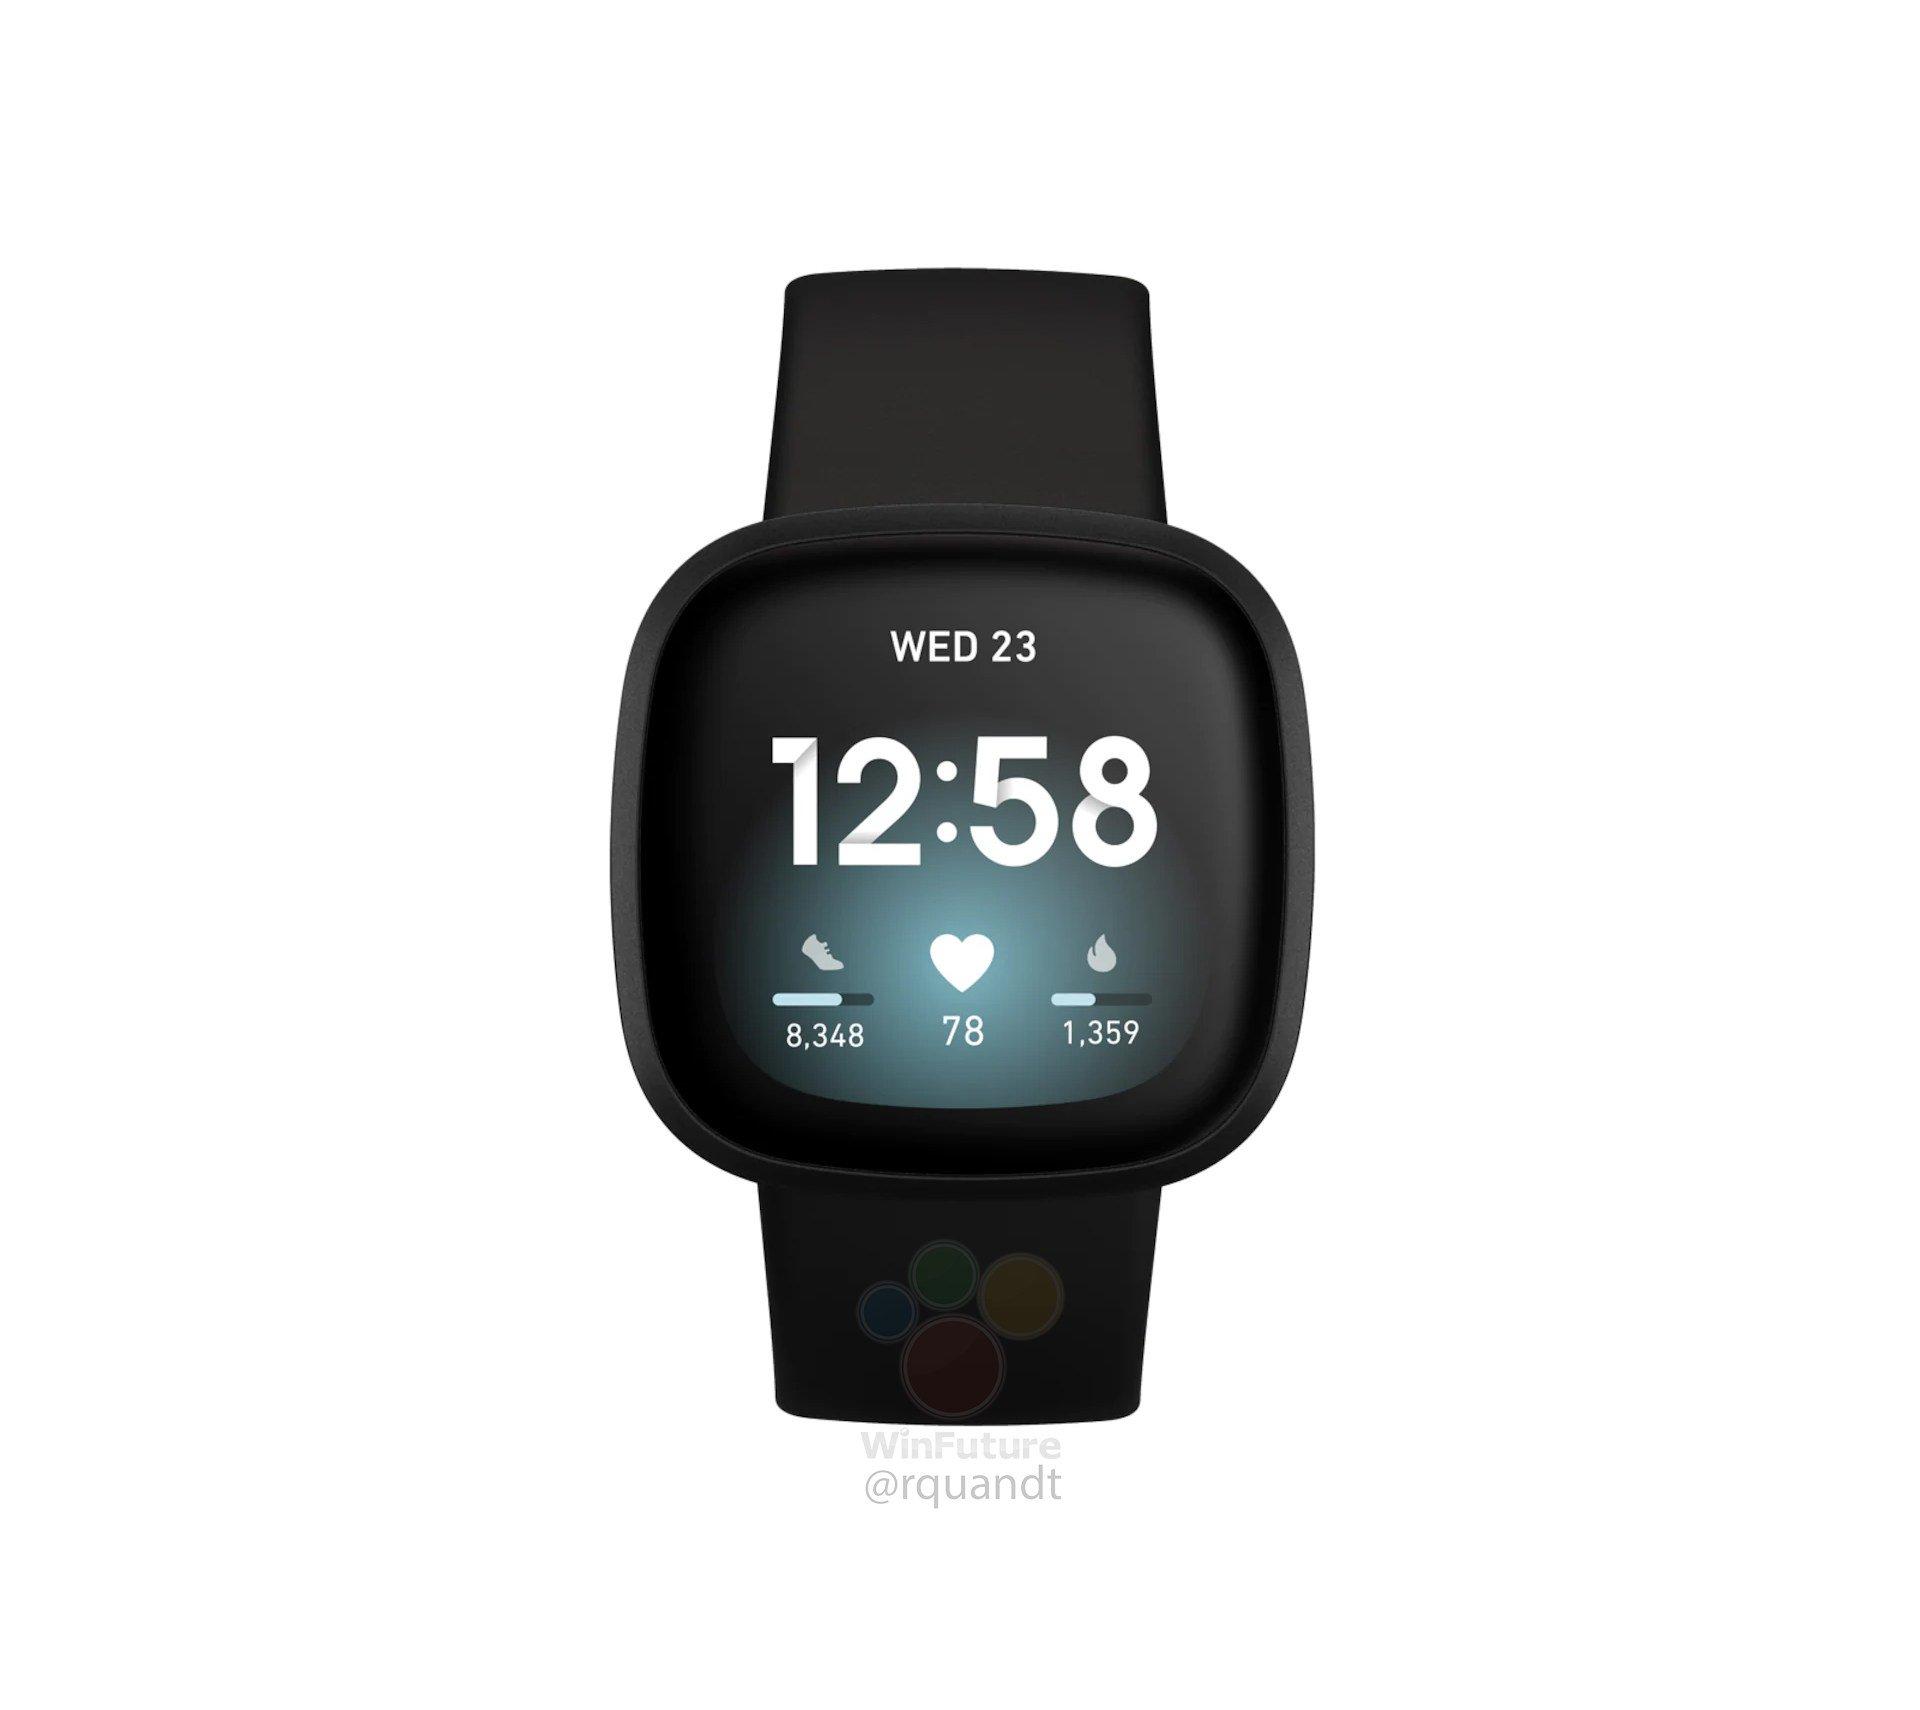 Fitbit Versa 3, Inspire 2 & Sense renders leak suggesting imminent launch